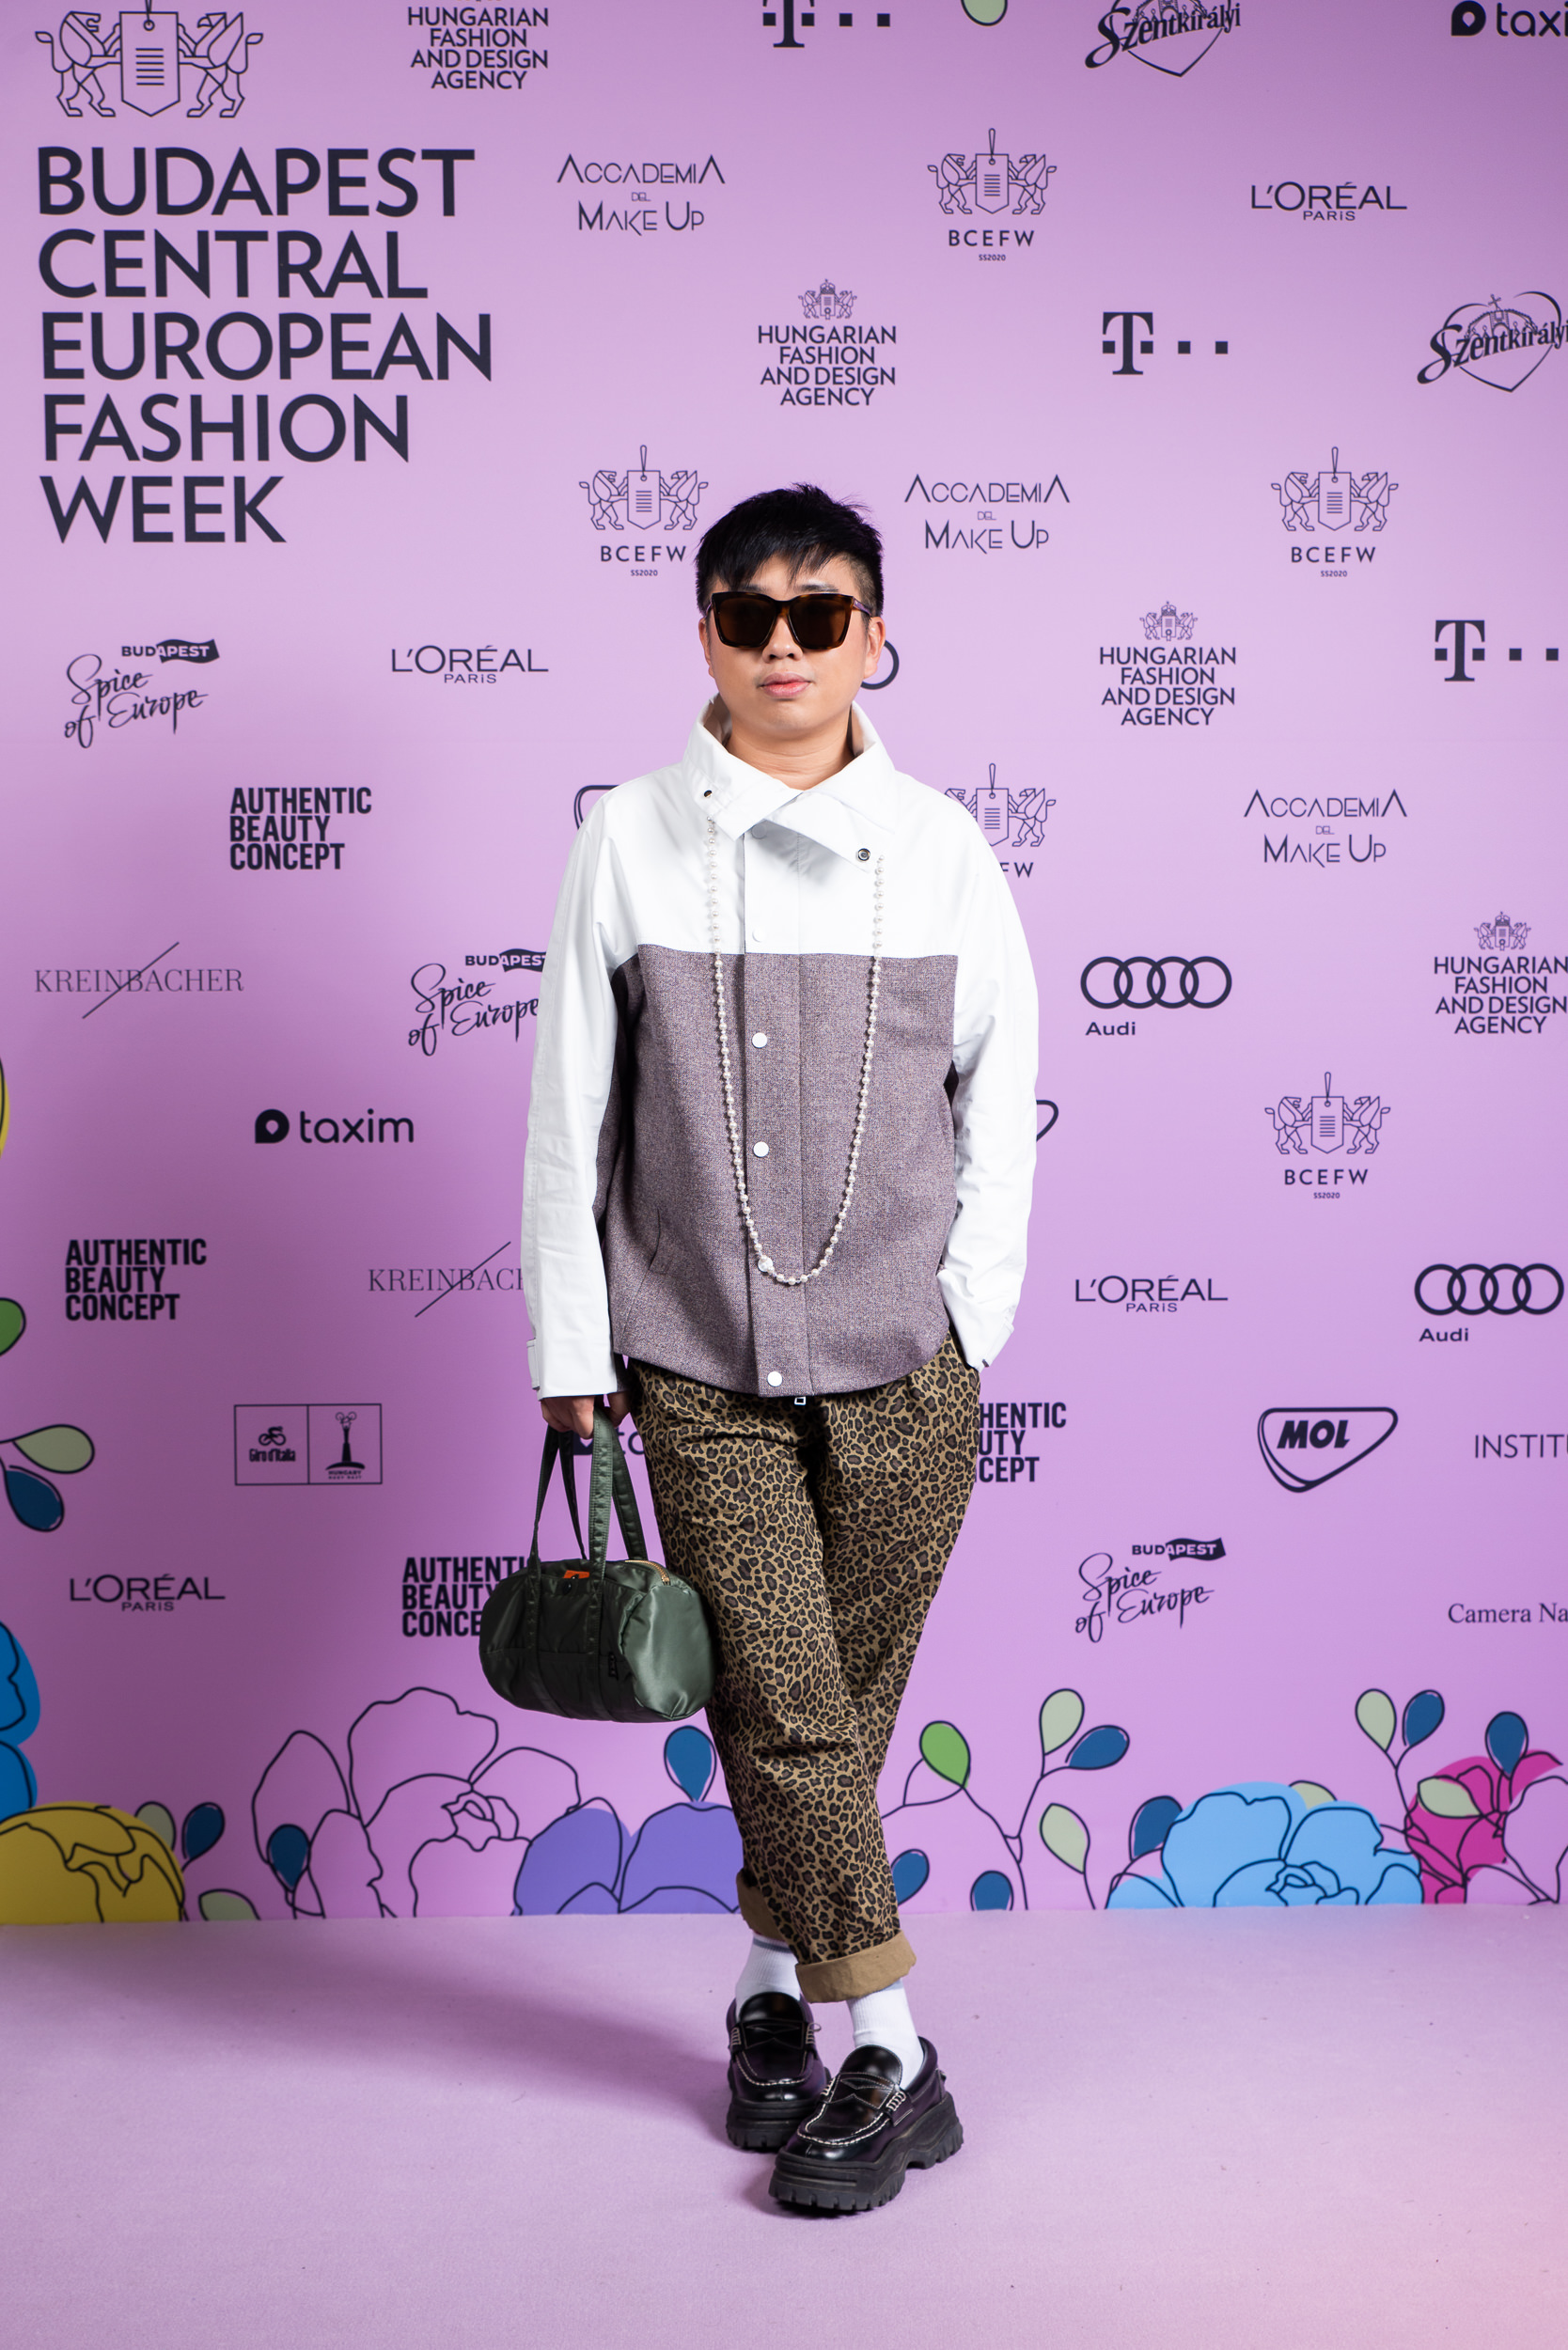 Declan Chan kínai influencer